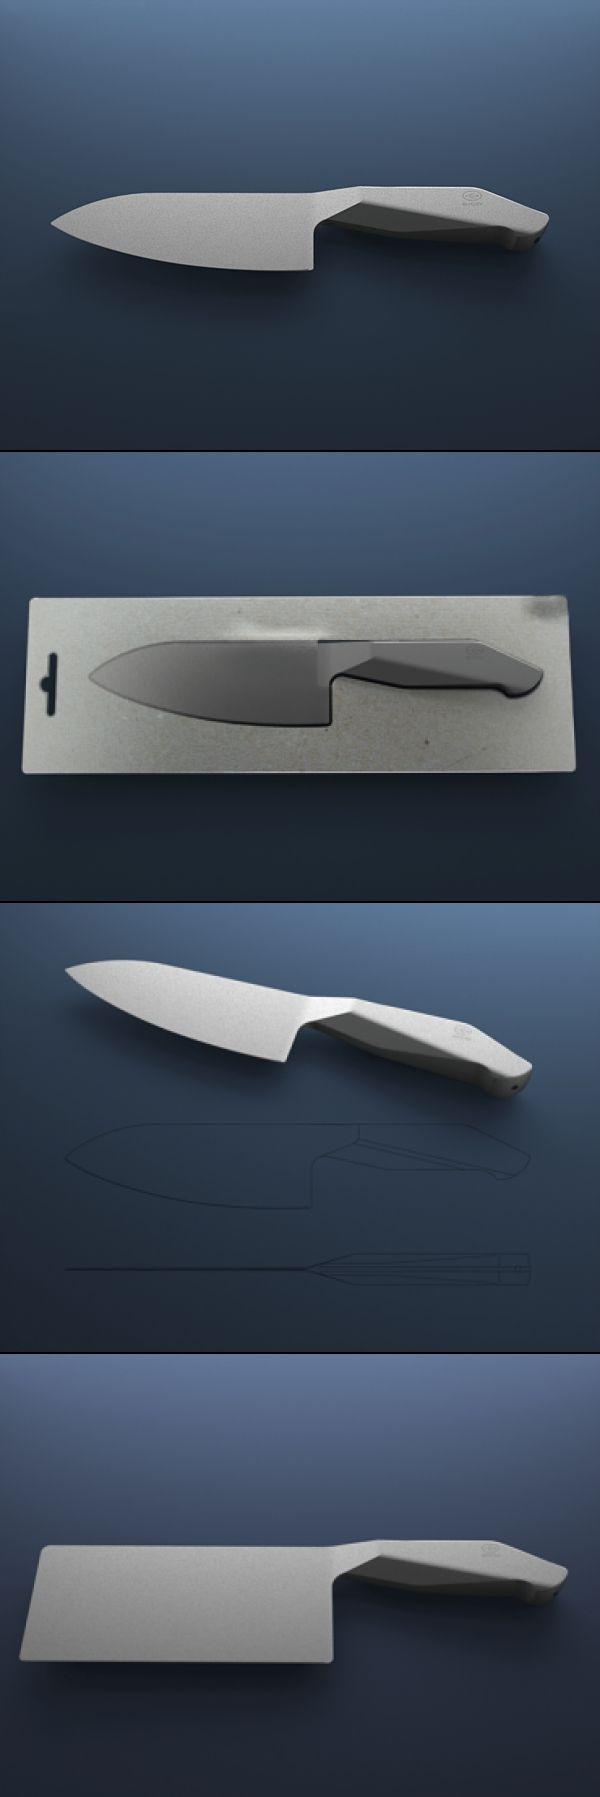 PRO TEFLON KNIFE SET BY BRUNO FOSI